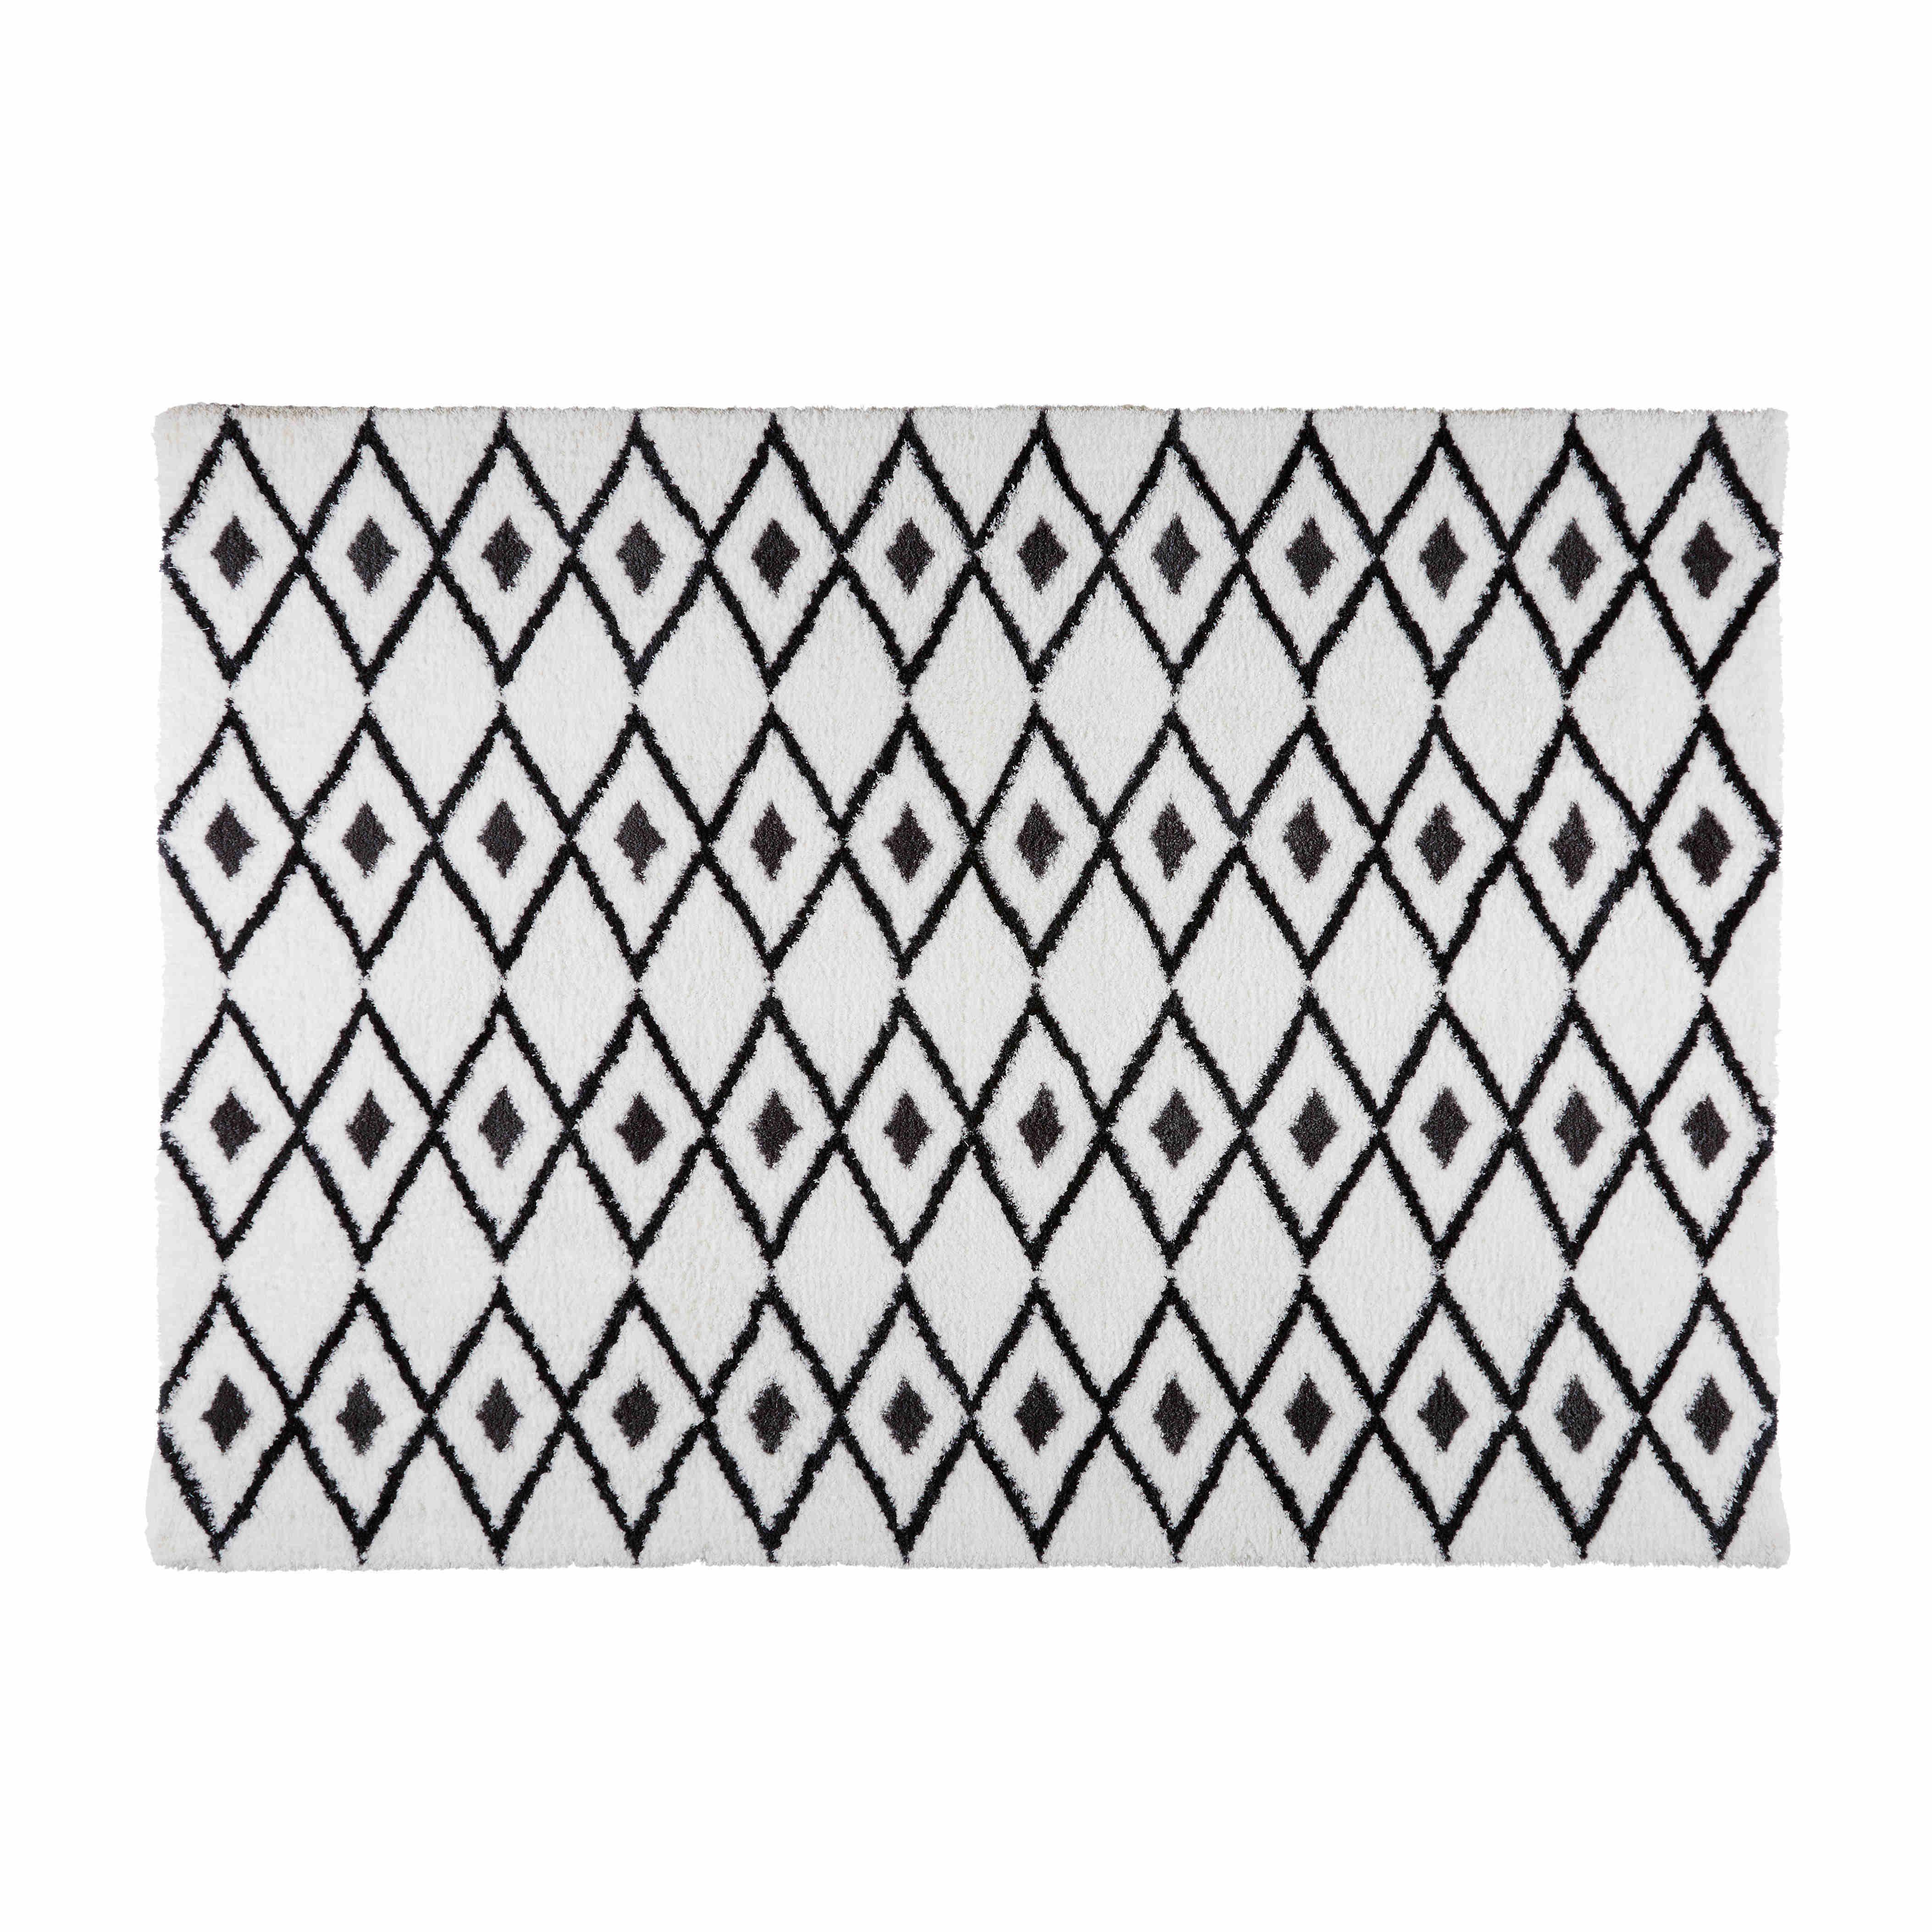 tapis berb re noir et blanc 160x230 salon black white. Black Bedroom Furniture Sets. Home Design Ideas